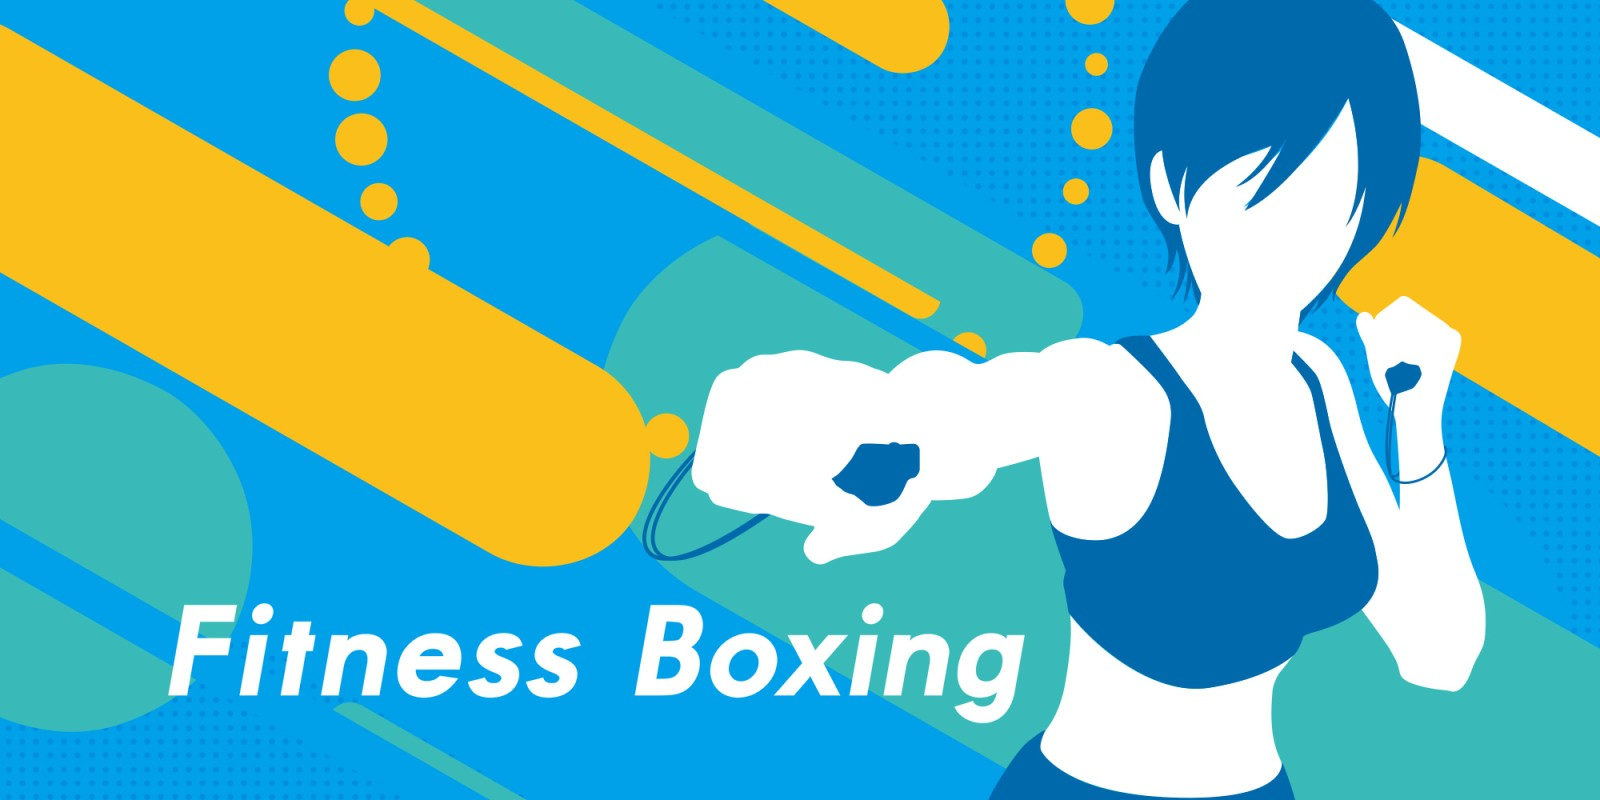 Fitness Boxing logo